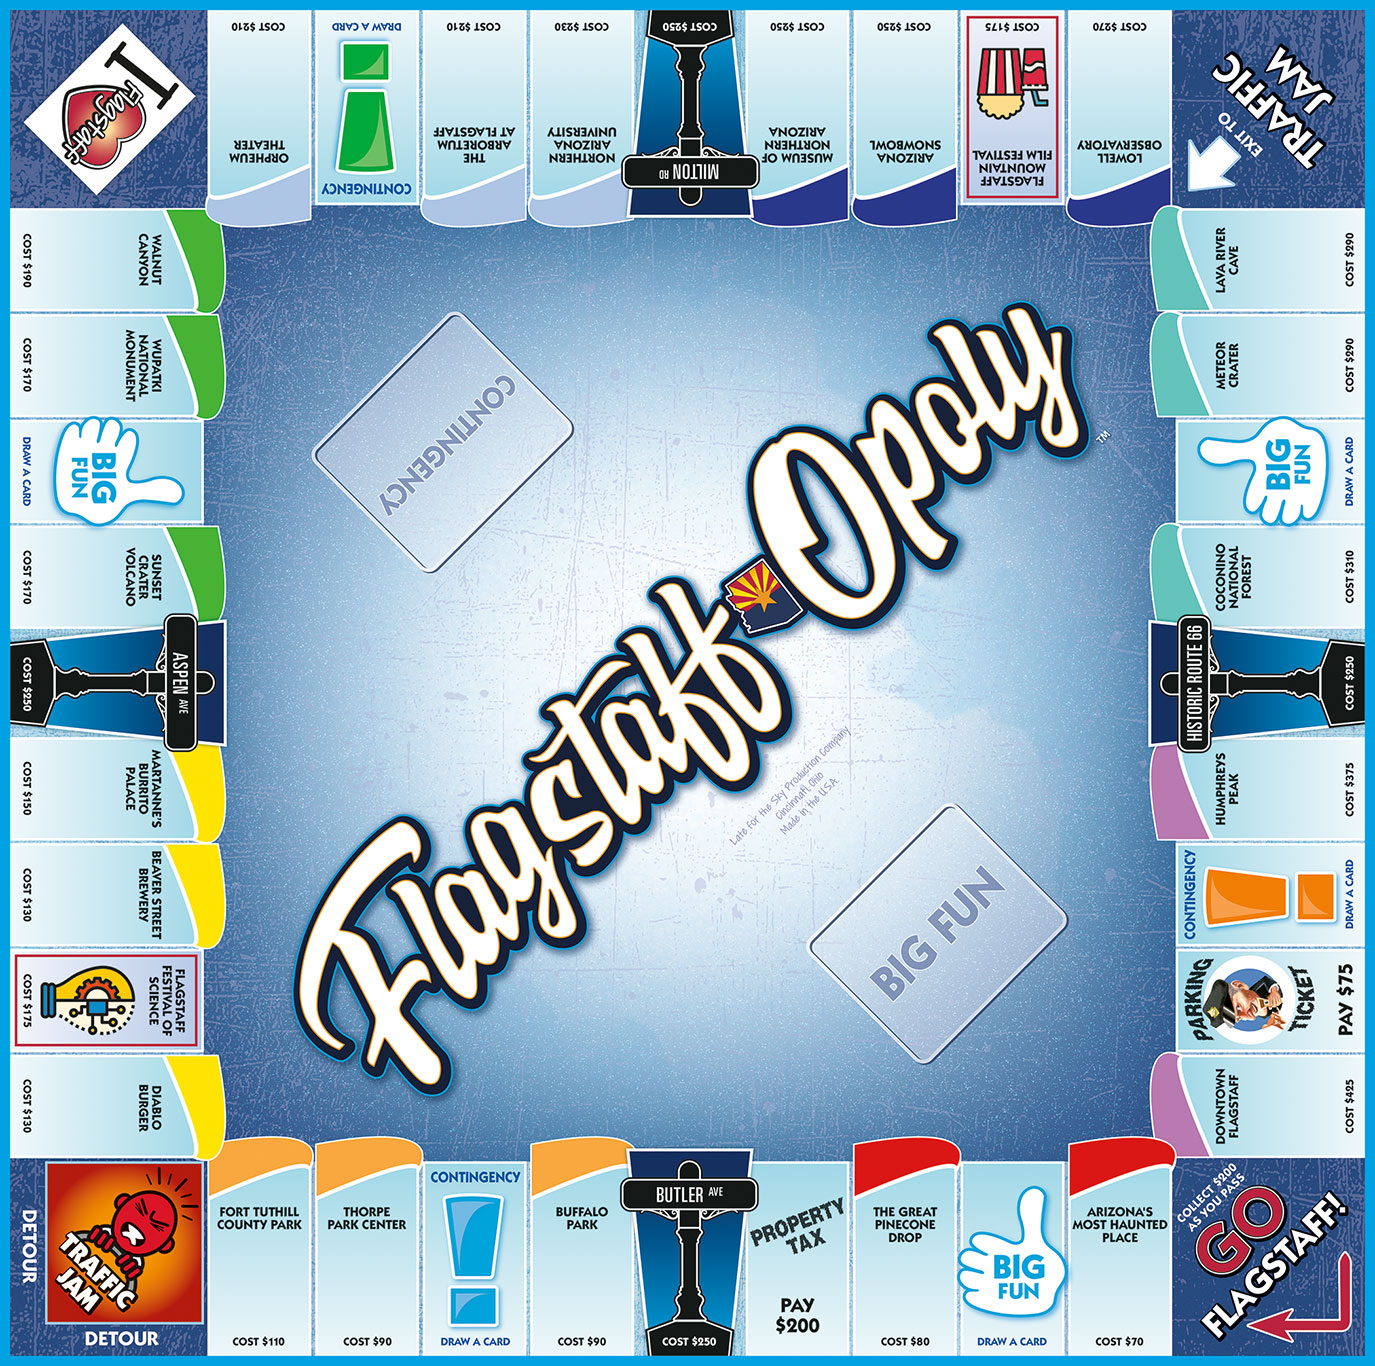 FLAGSTAFF-OPOLY Board Game